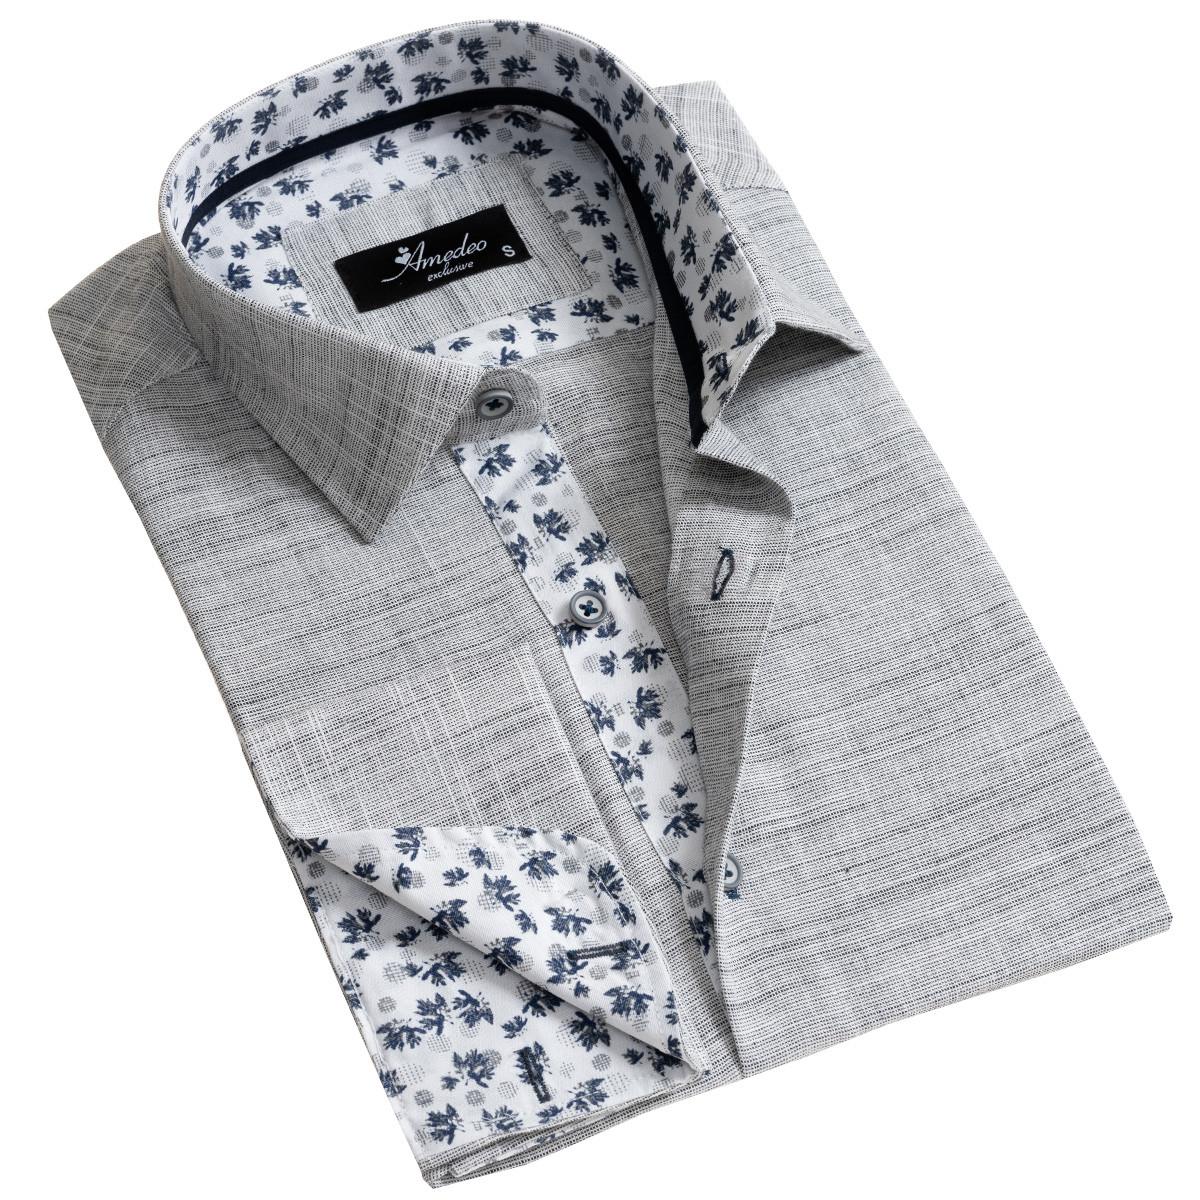 European Made & Designed Reversible Cuff Premium French Cuff Dress Shirt - light grey